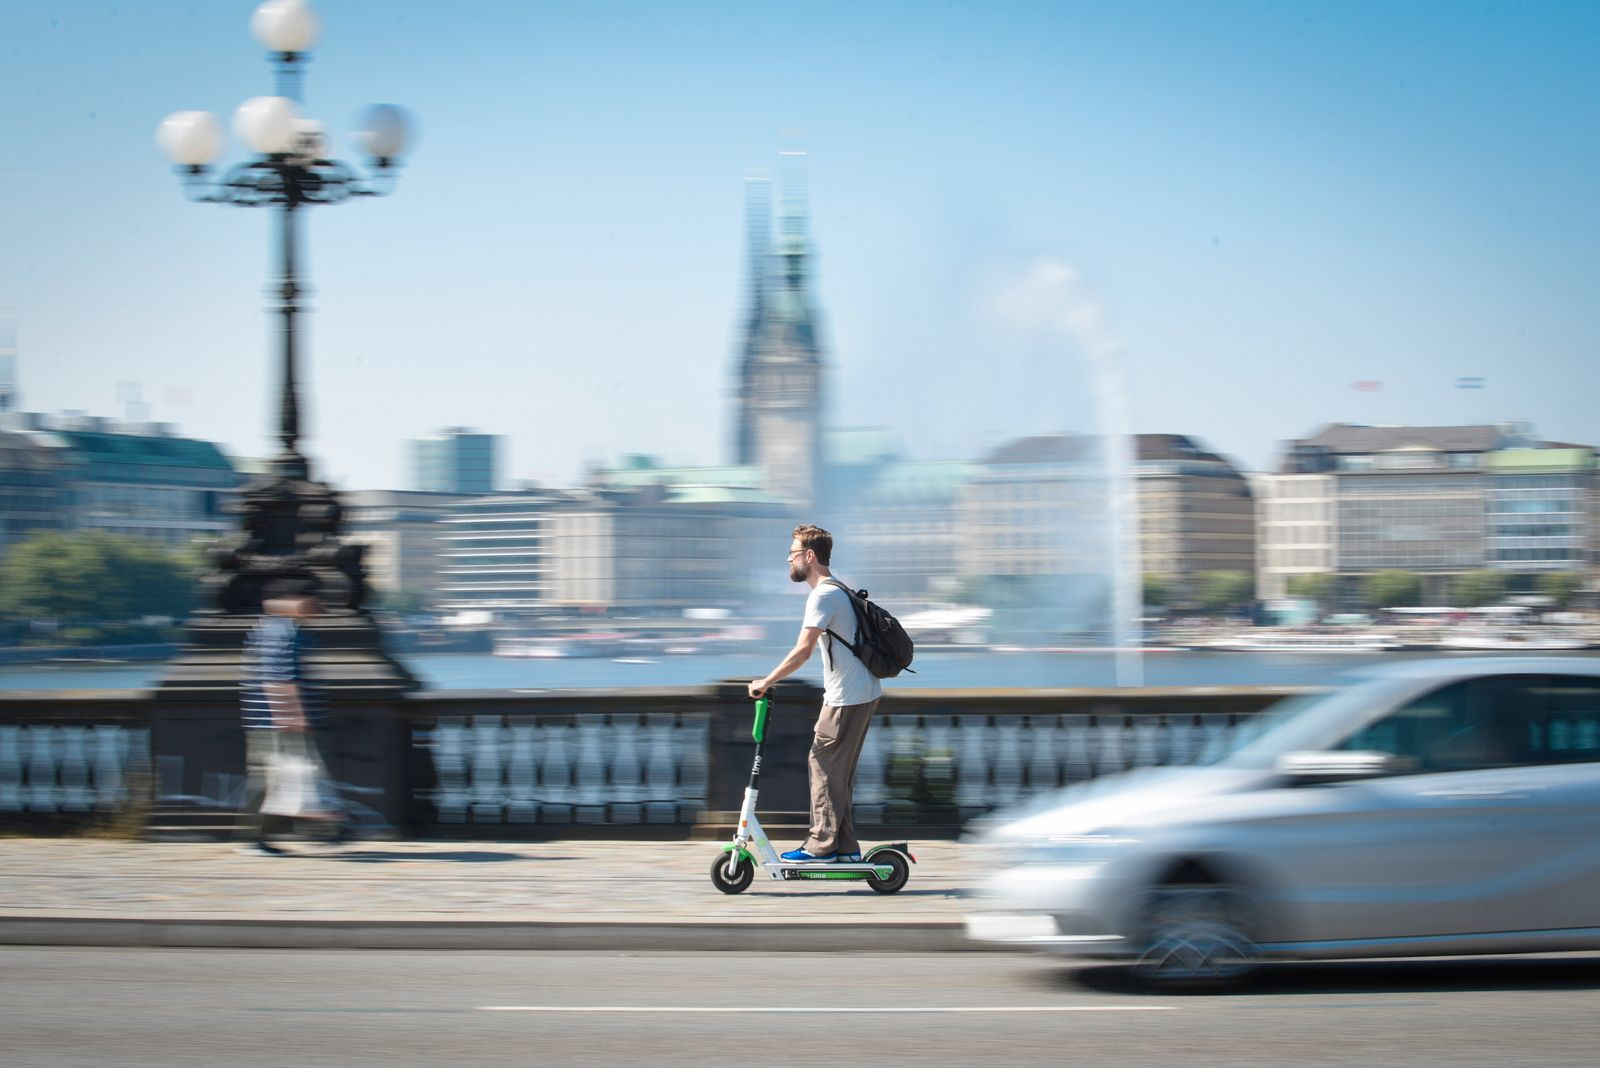 Rollertest,_Juni_2019,_Foto-Pflug,_Bild03